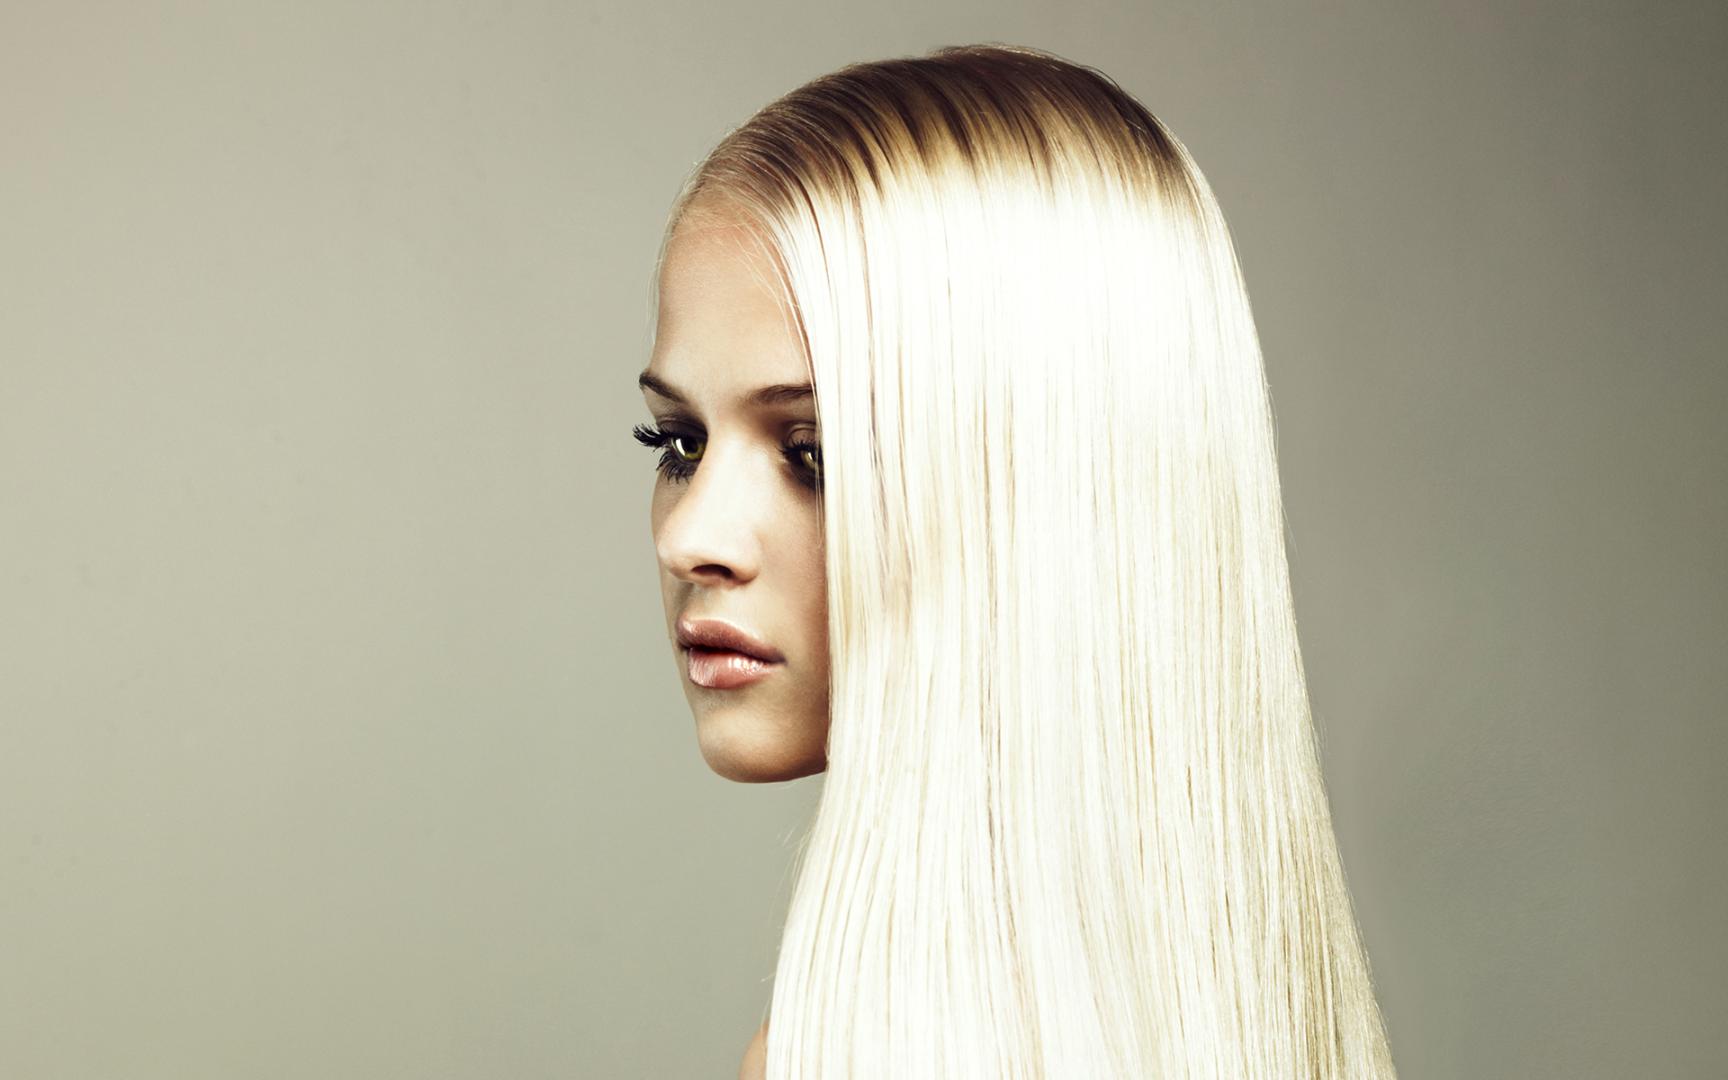 Infinity Hair Design About Us Hair Salon Berowra Heights Sydney